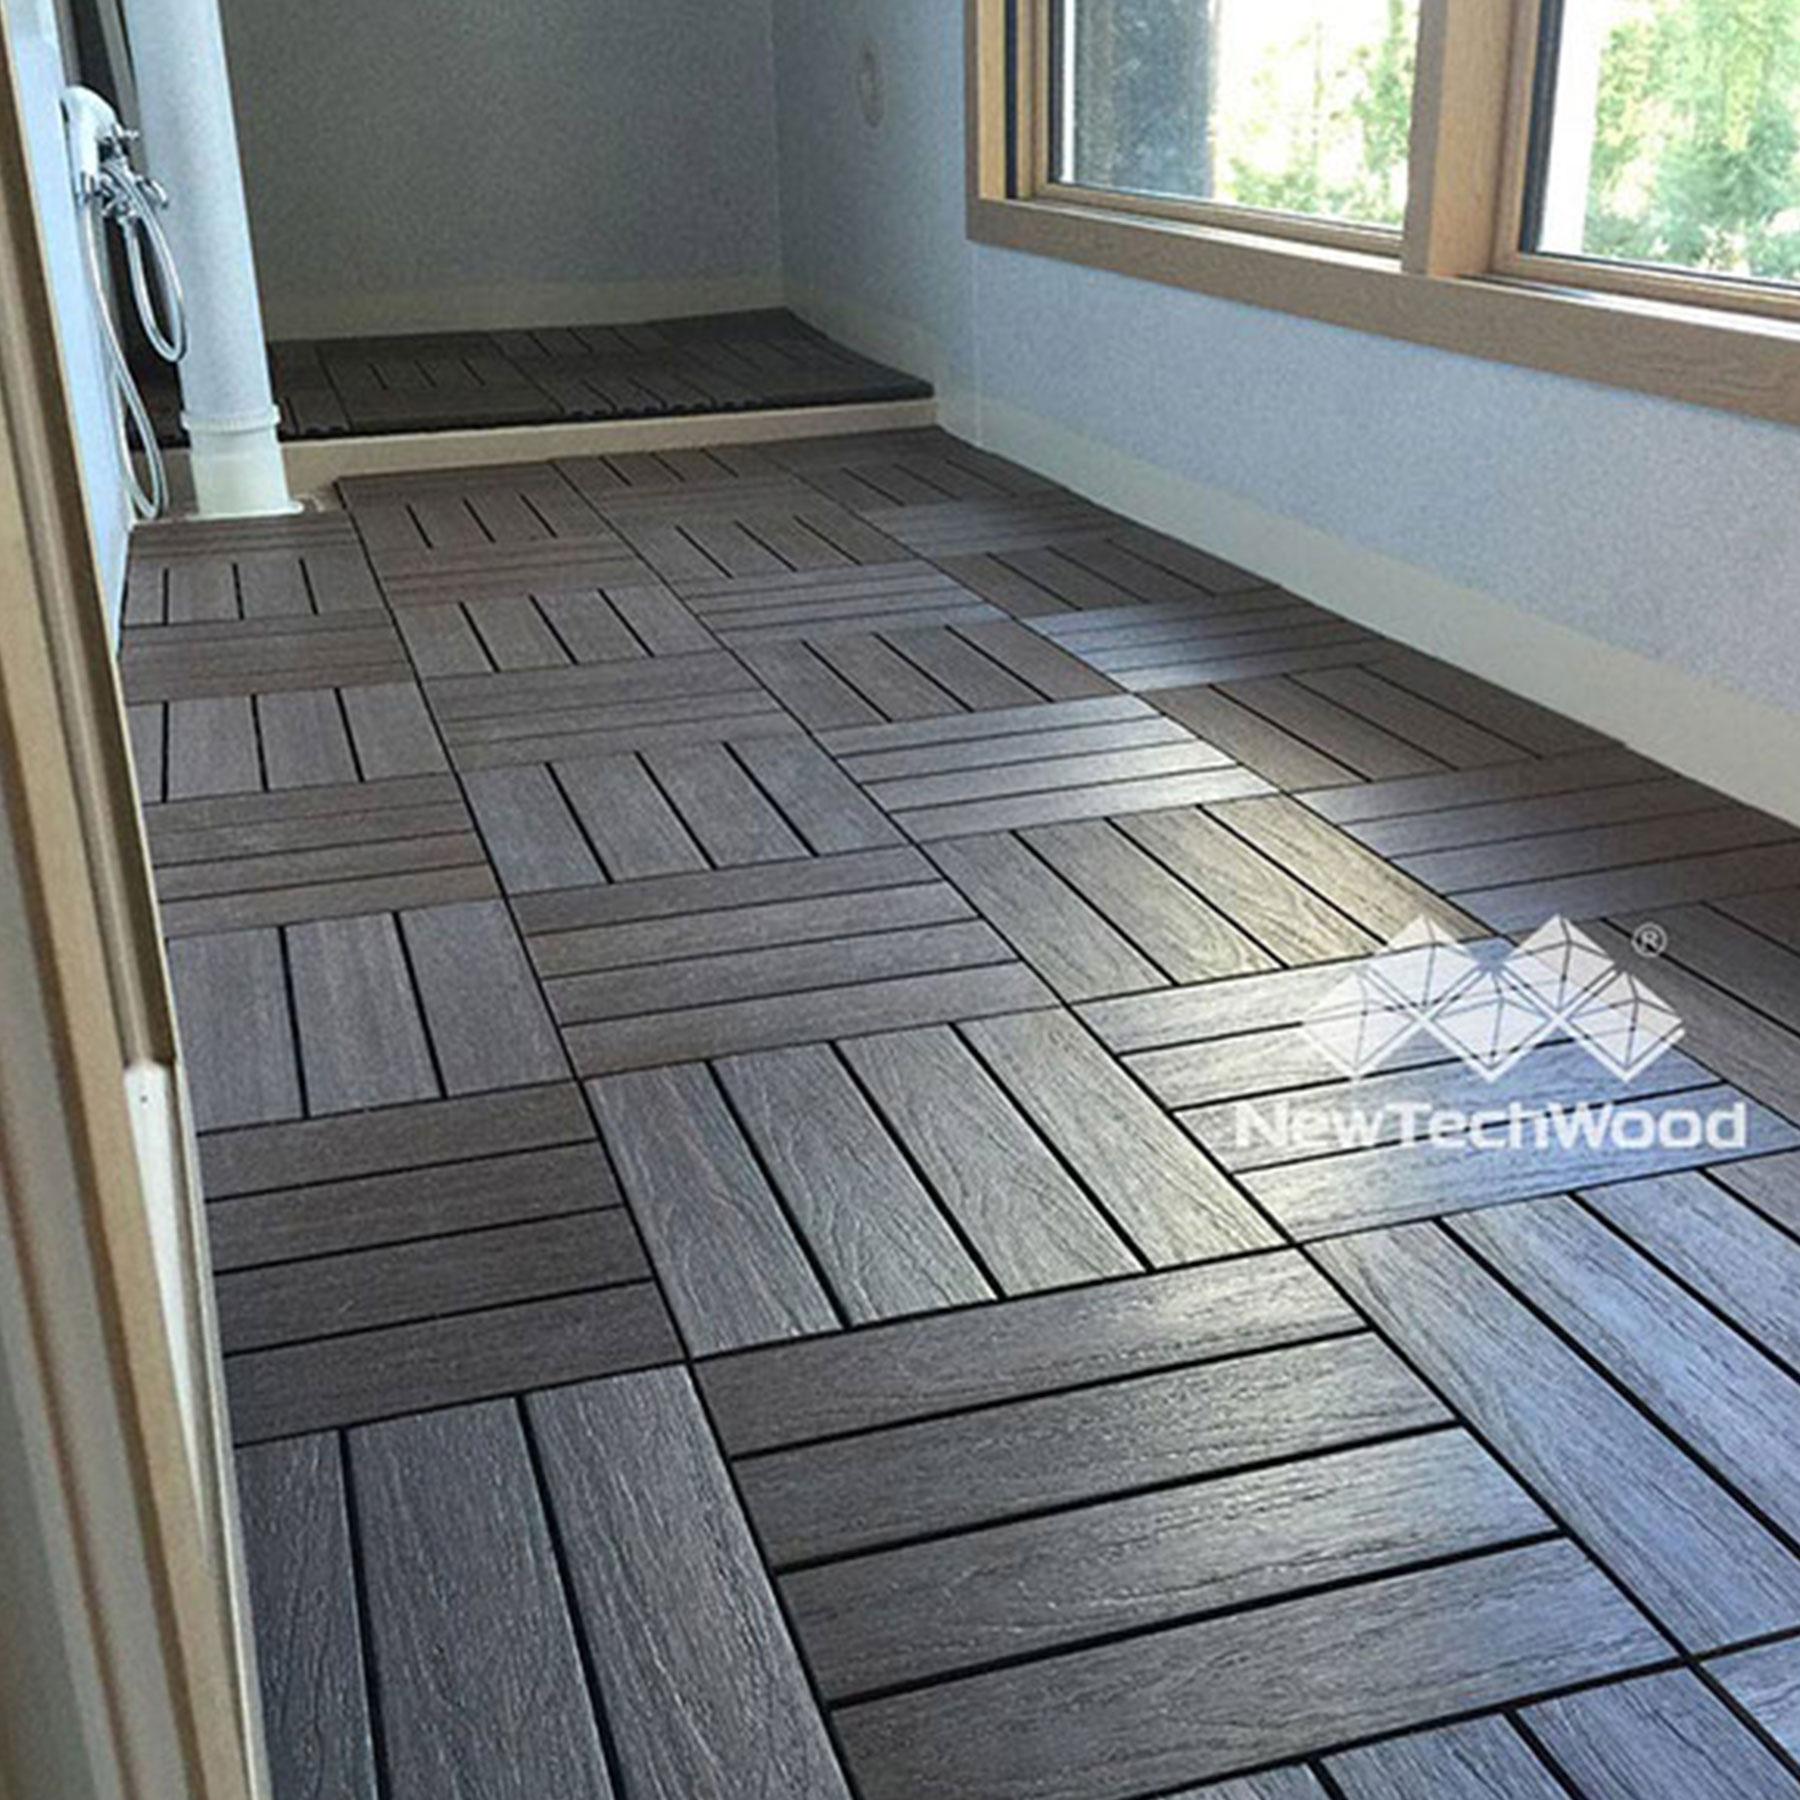 Newtechwood Ultrashield Deck Tiles 009 Newtechwood Uk